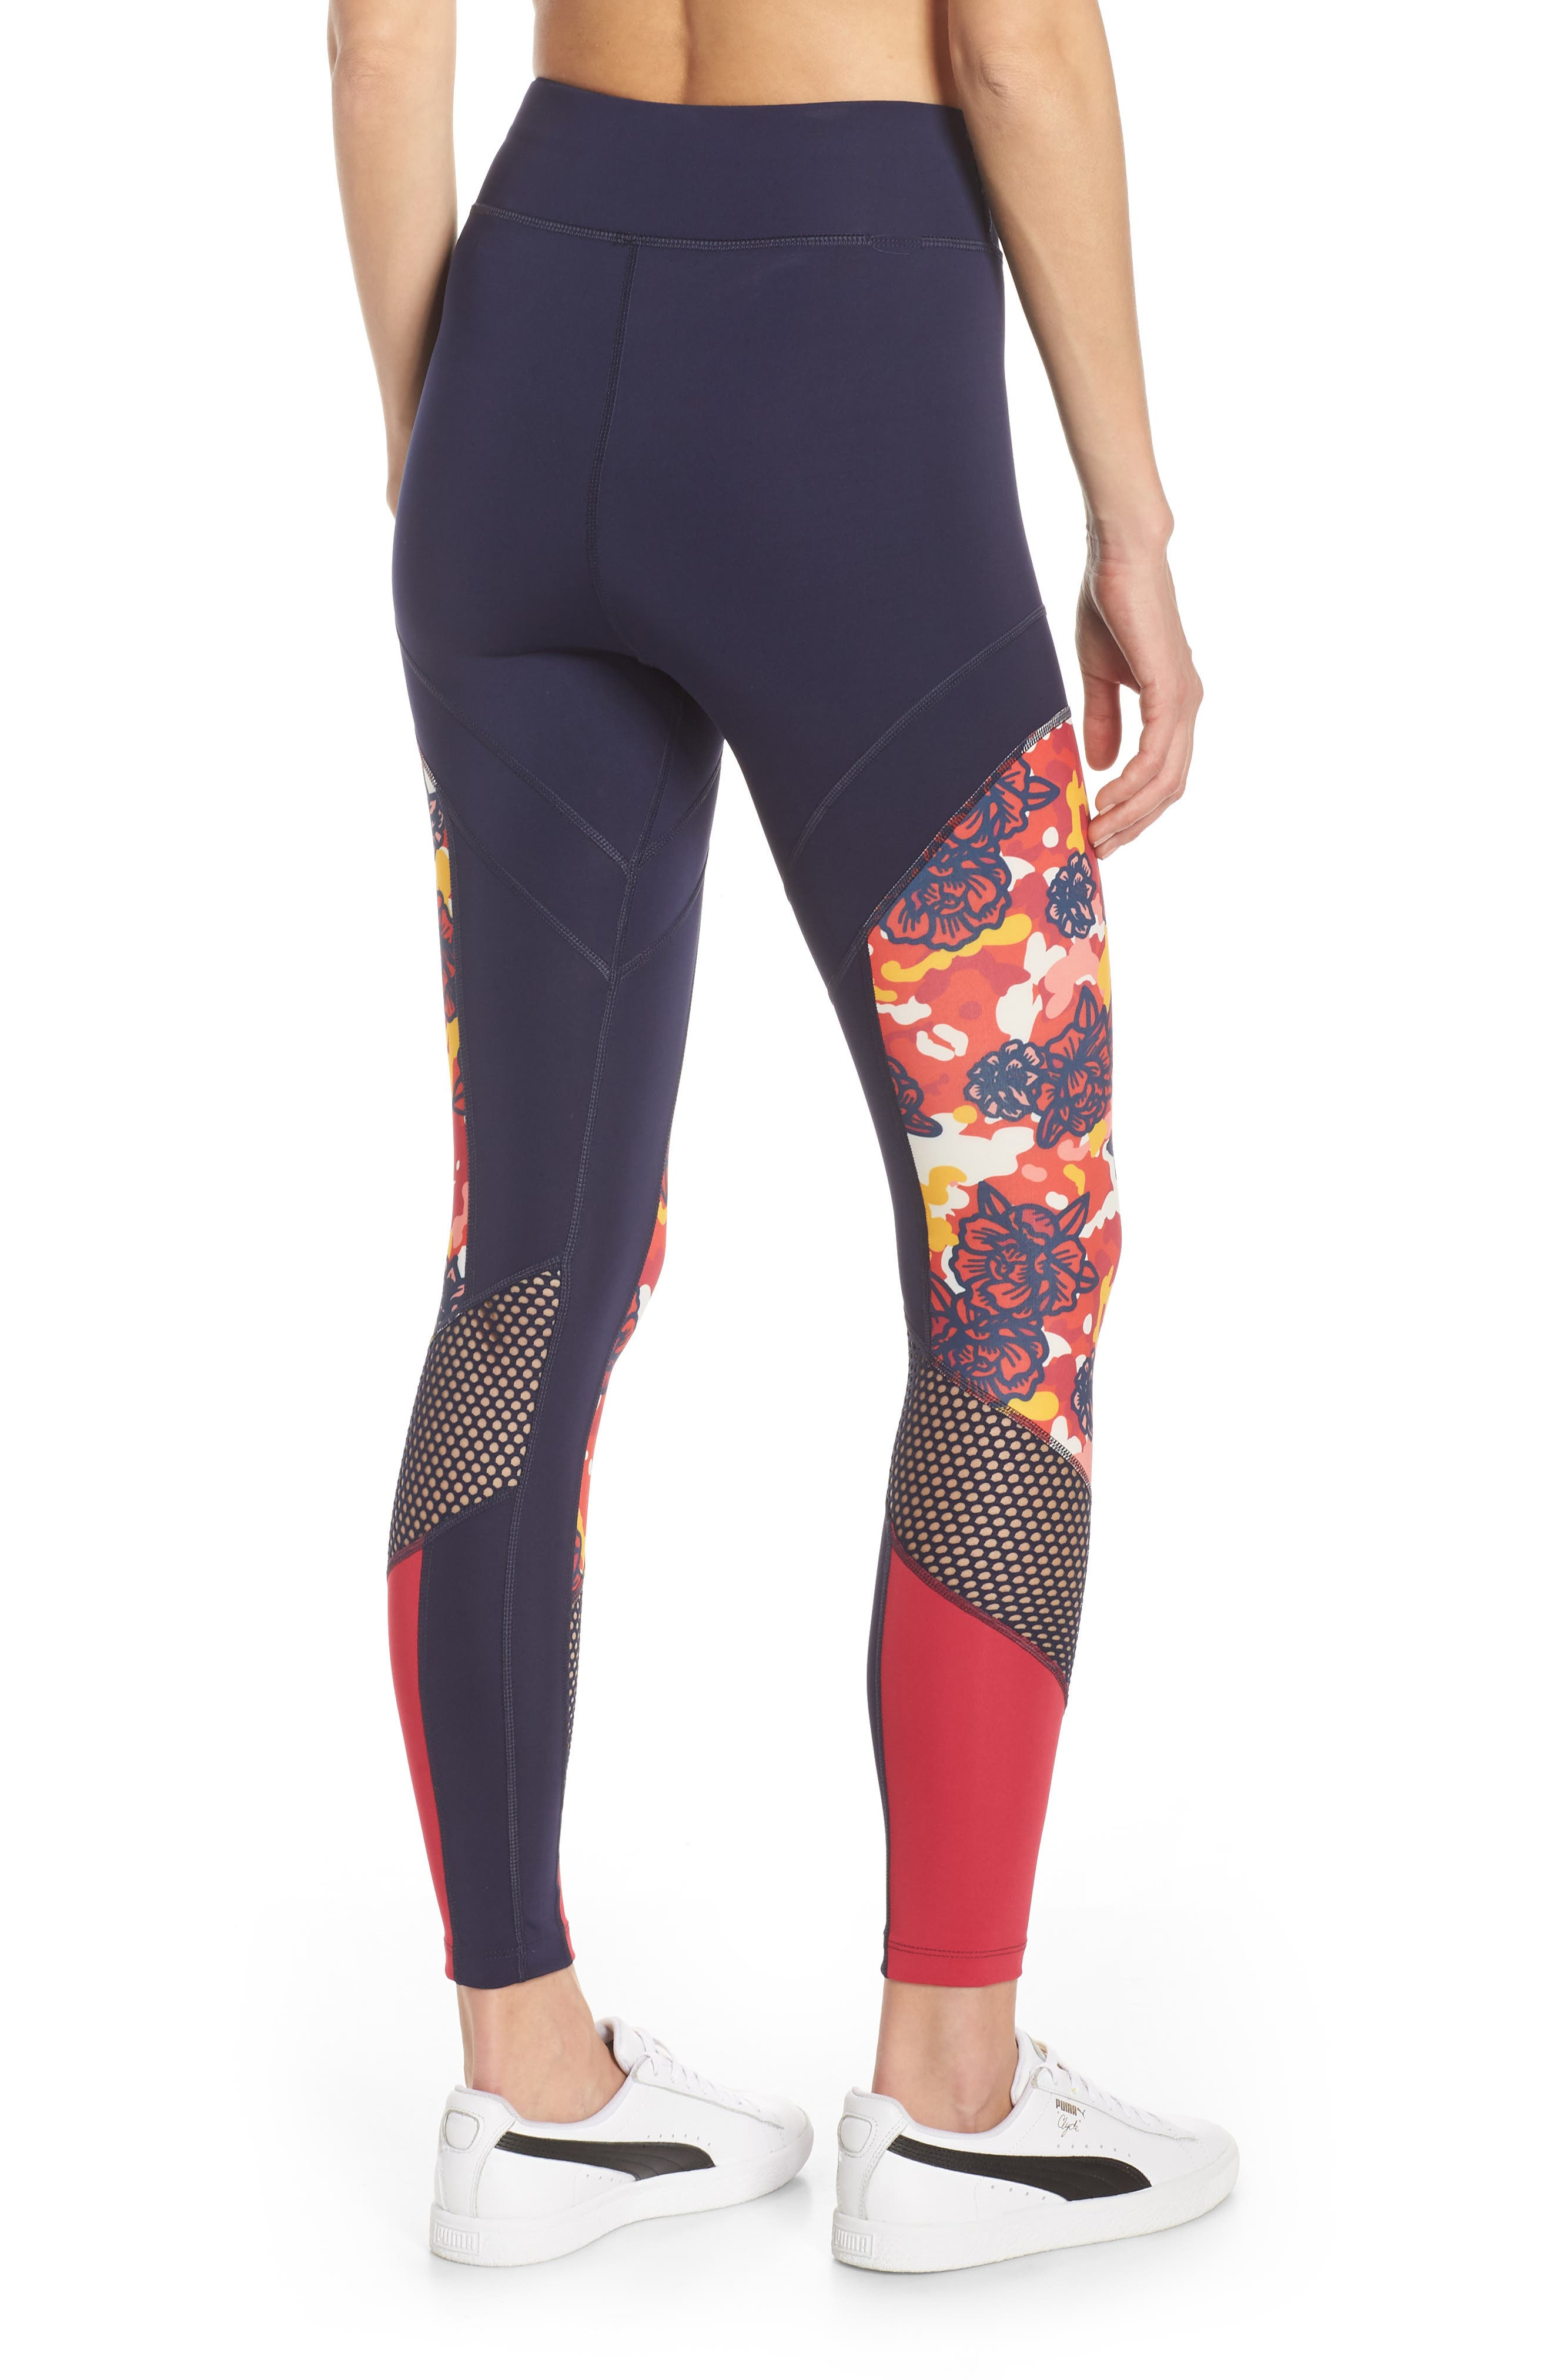 PUMA, Flourish Flourish XTG Leggings, Alternate thumbnail 2, color, PEACOAT-HIBISCUS MULTI